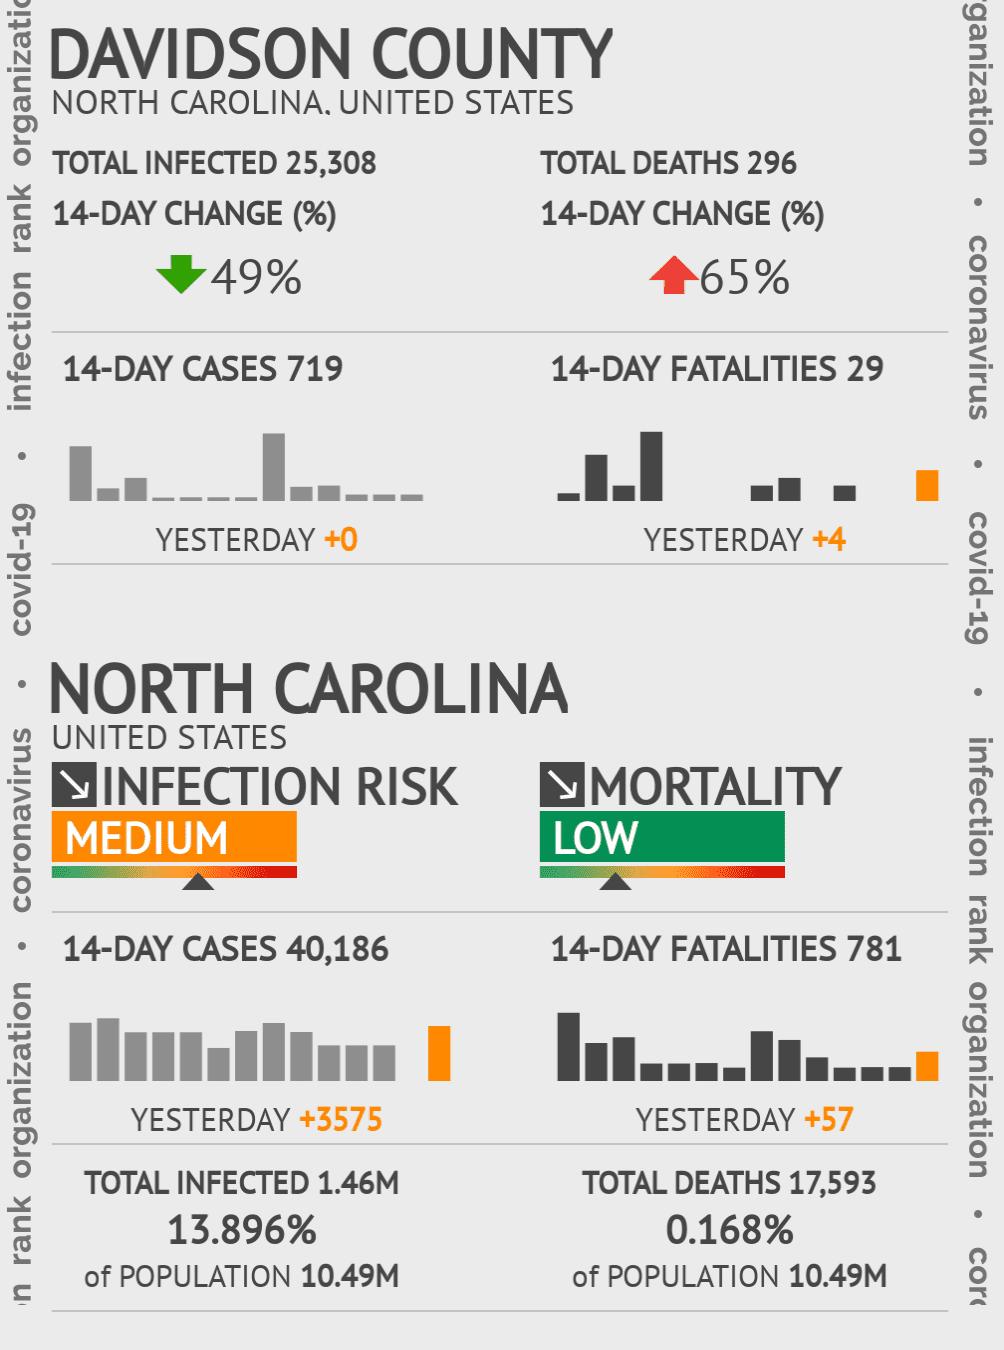 Davidson County Coronavirus Covid-19 Risk of Infection on November 26, 2020